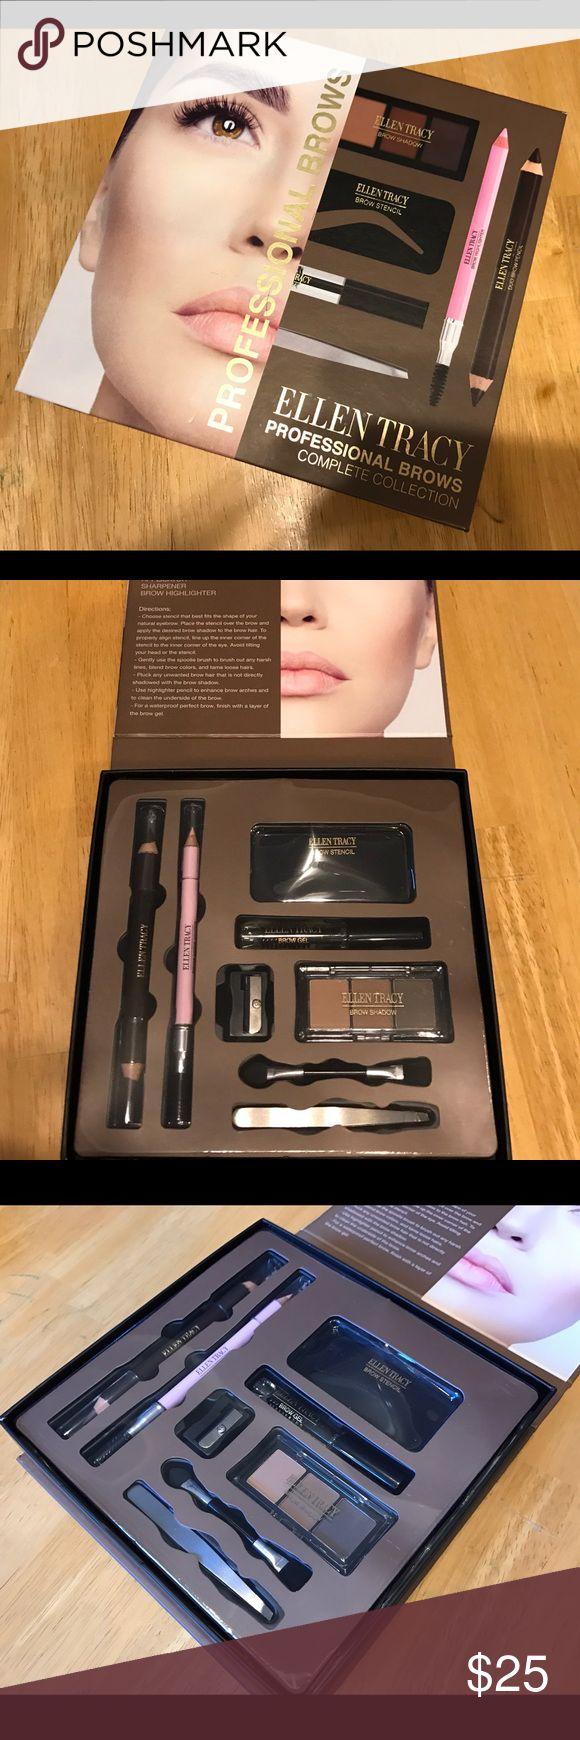 ♨️JUST IN- Professional Brow Complete Collection Set includes: ▪️Brow Gel ▪️Brow Shadow ▪️Brow Highlighter ▪️Duo Brow Pencil ▪️Tweezer ▪️ Brow Stencil ▪️Sharpener ▪️Applicator. Ellen Tracy Makeup Eyebrow Filler